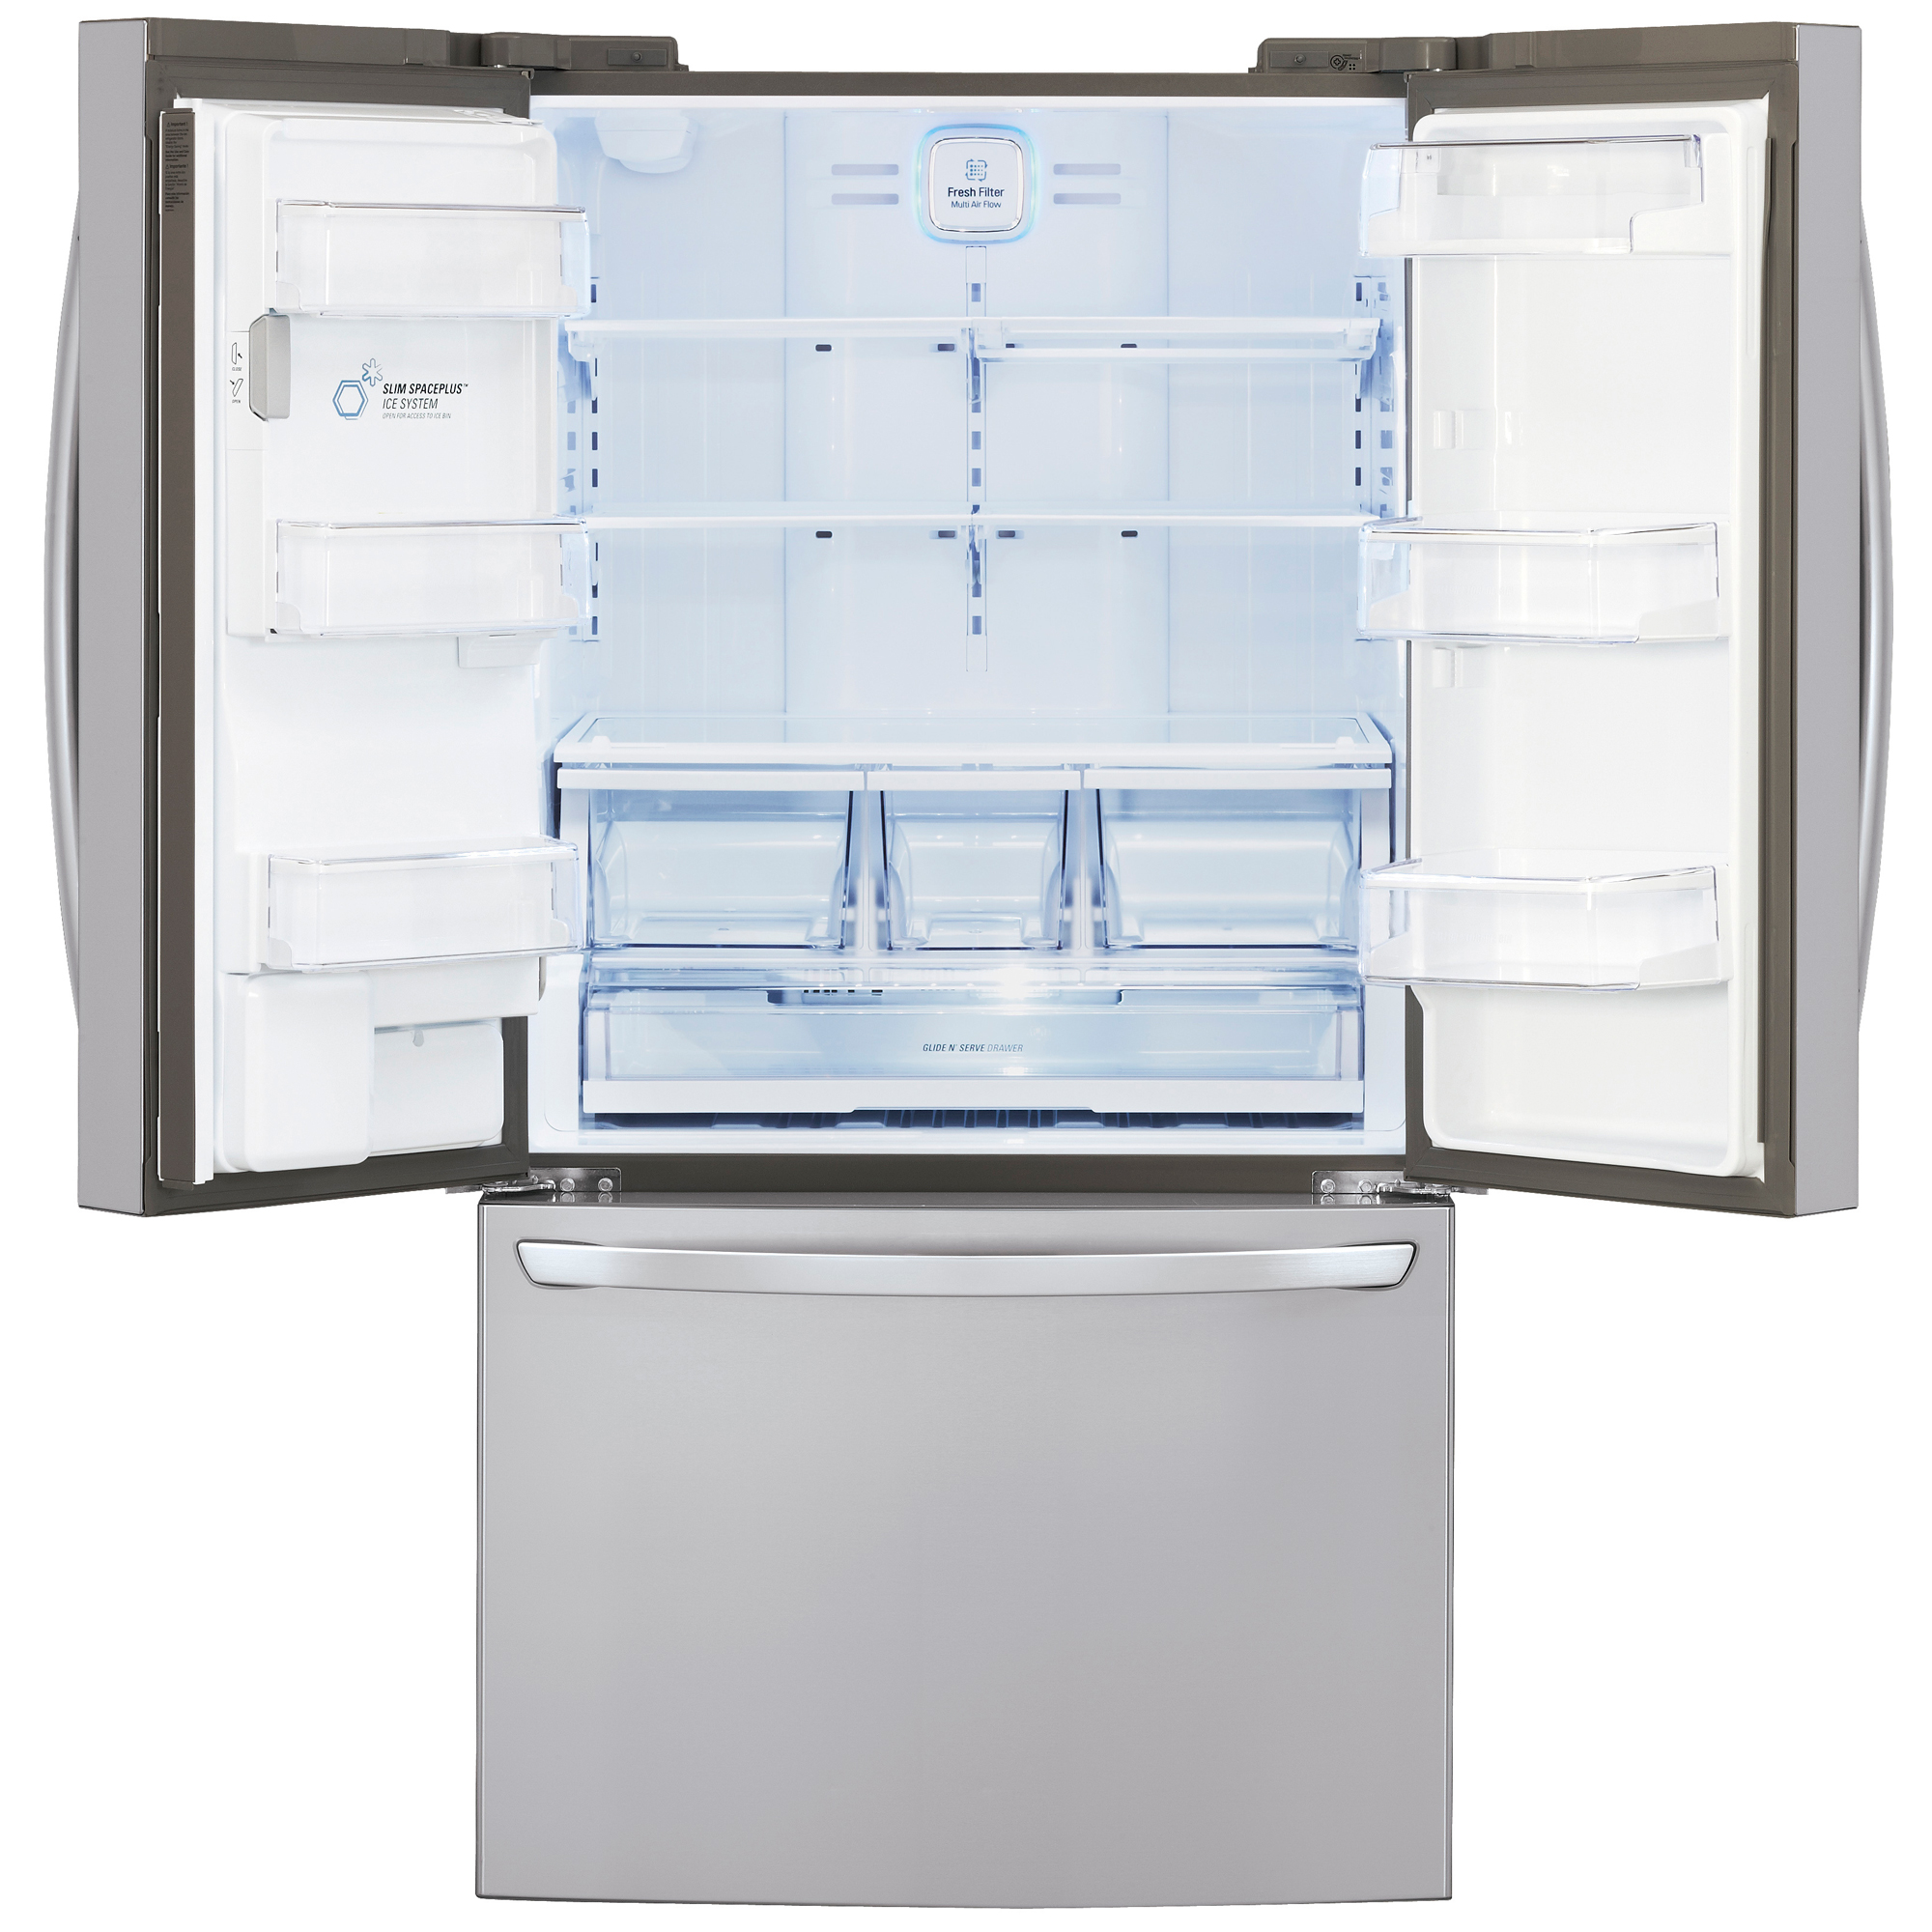 LG LFXS29626S 28.8 cu. ft. Ultra-Capacity French Door Refrigerator w/ Smart Cooling Plus